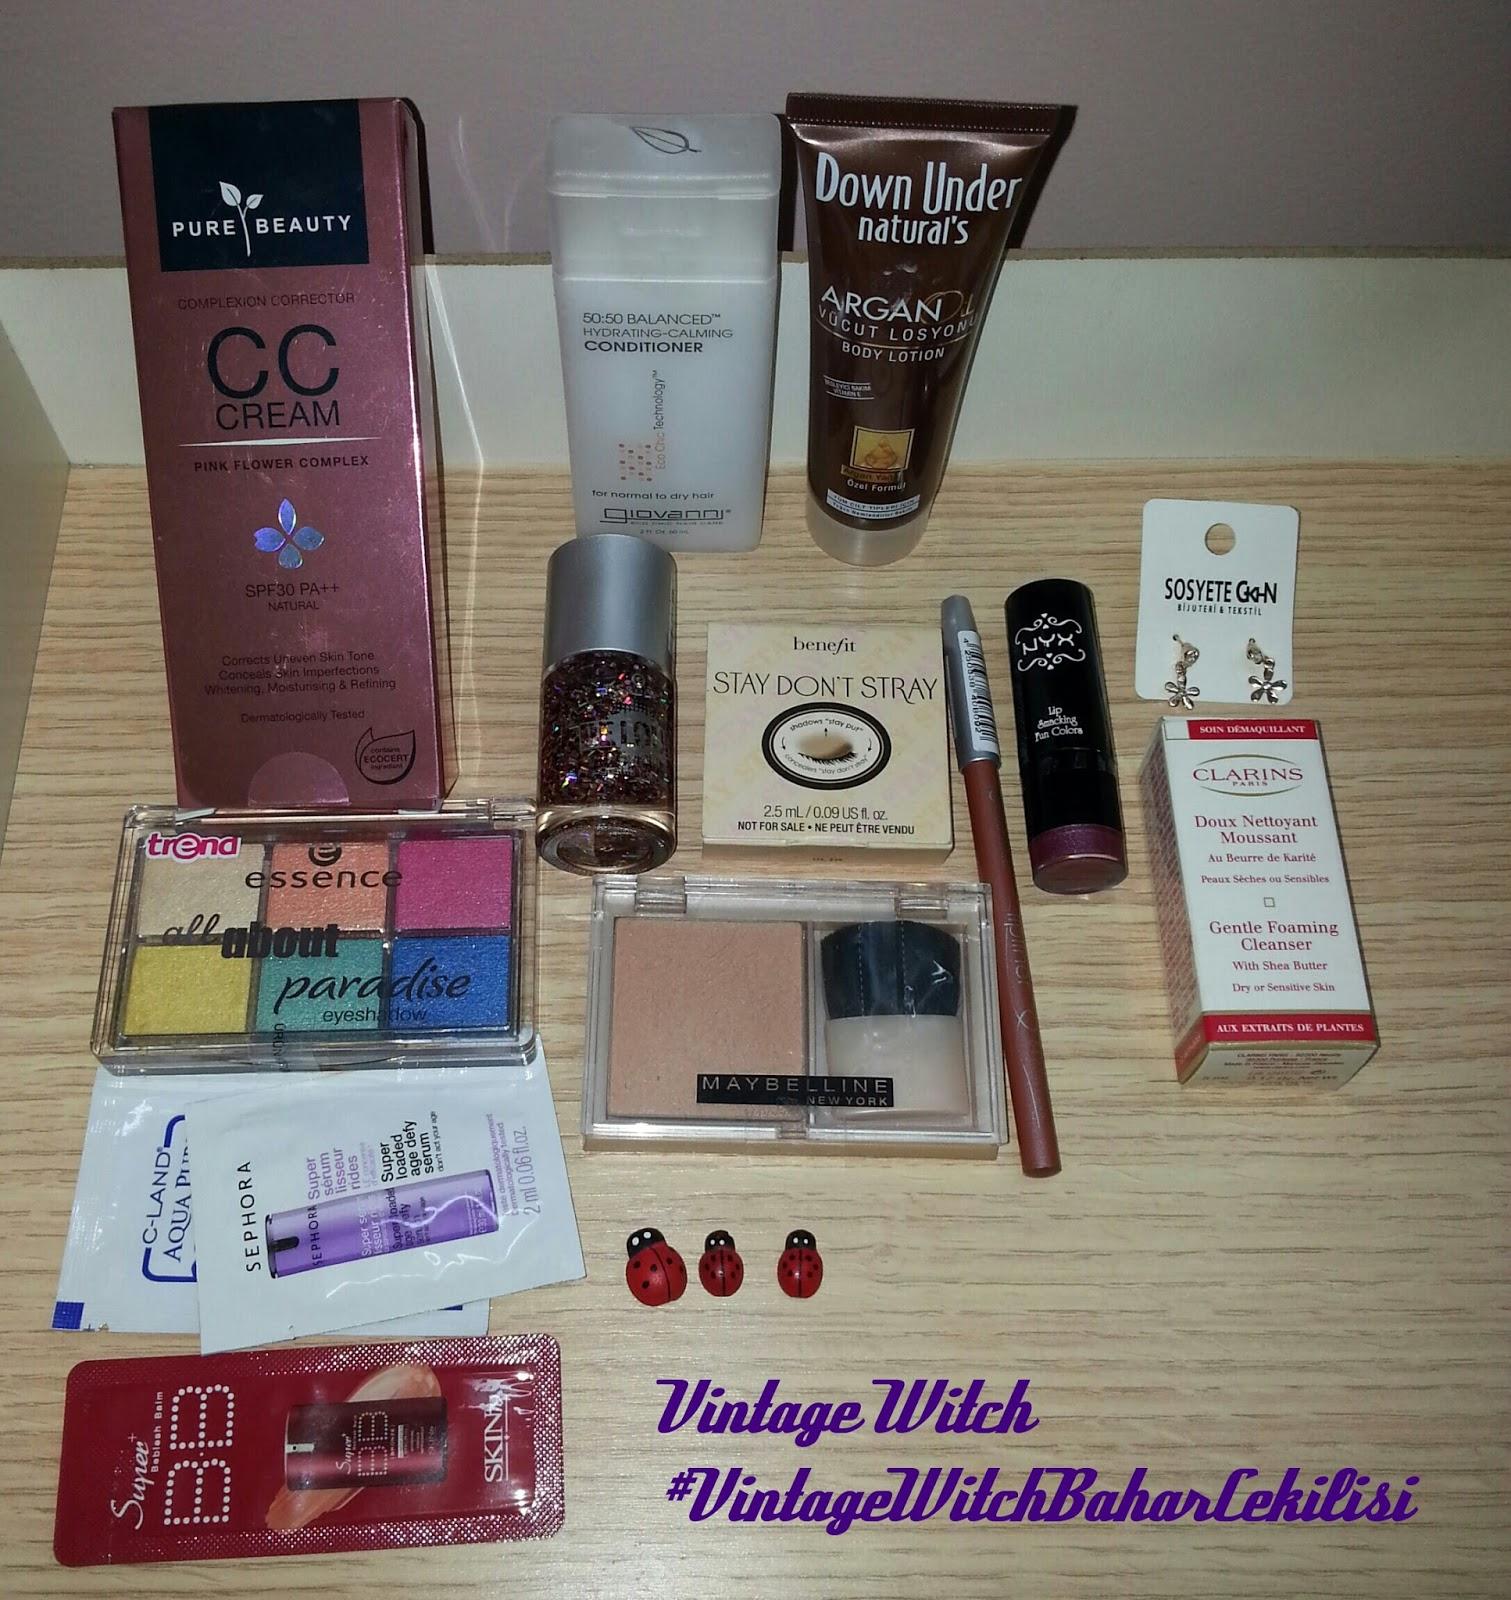 pure beauty cc krem, benefit, clarins, essence, skin79